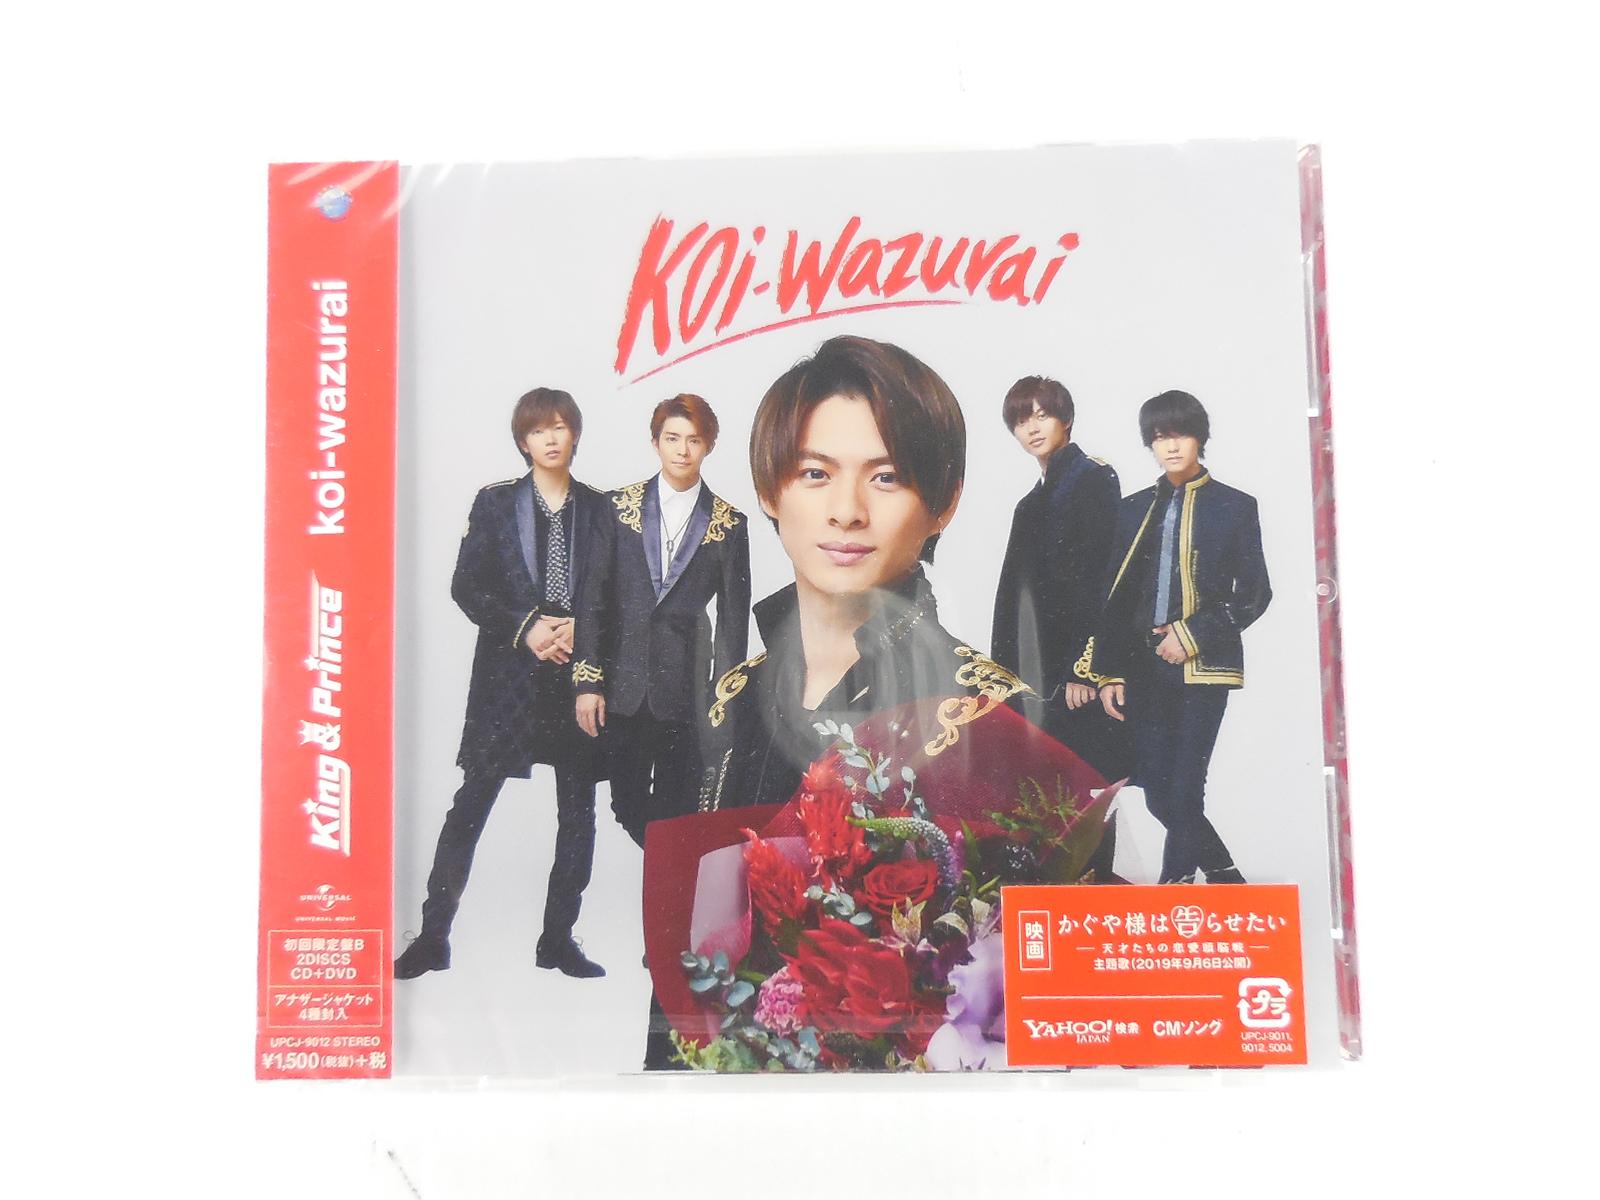 King & Prince koi-wazurai 初回限定版B アナザージャケット4種封入 2DISCS 【CD+DVD】 【未開封】